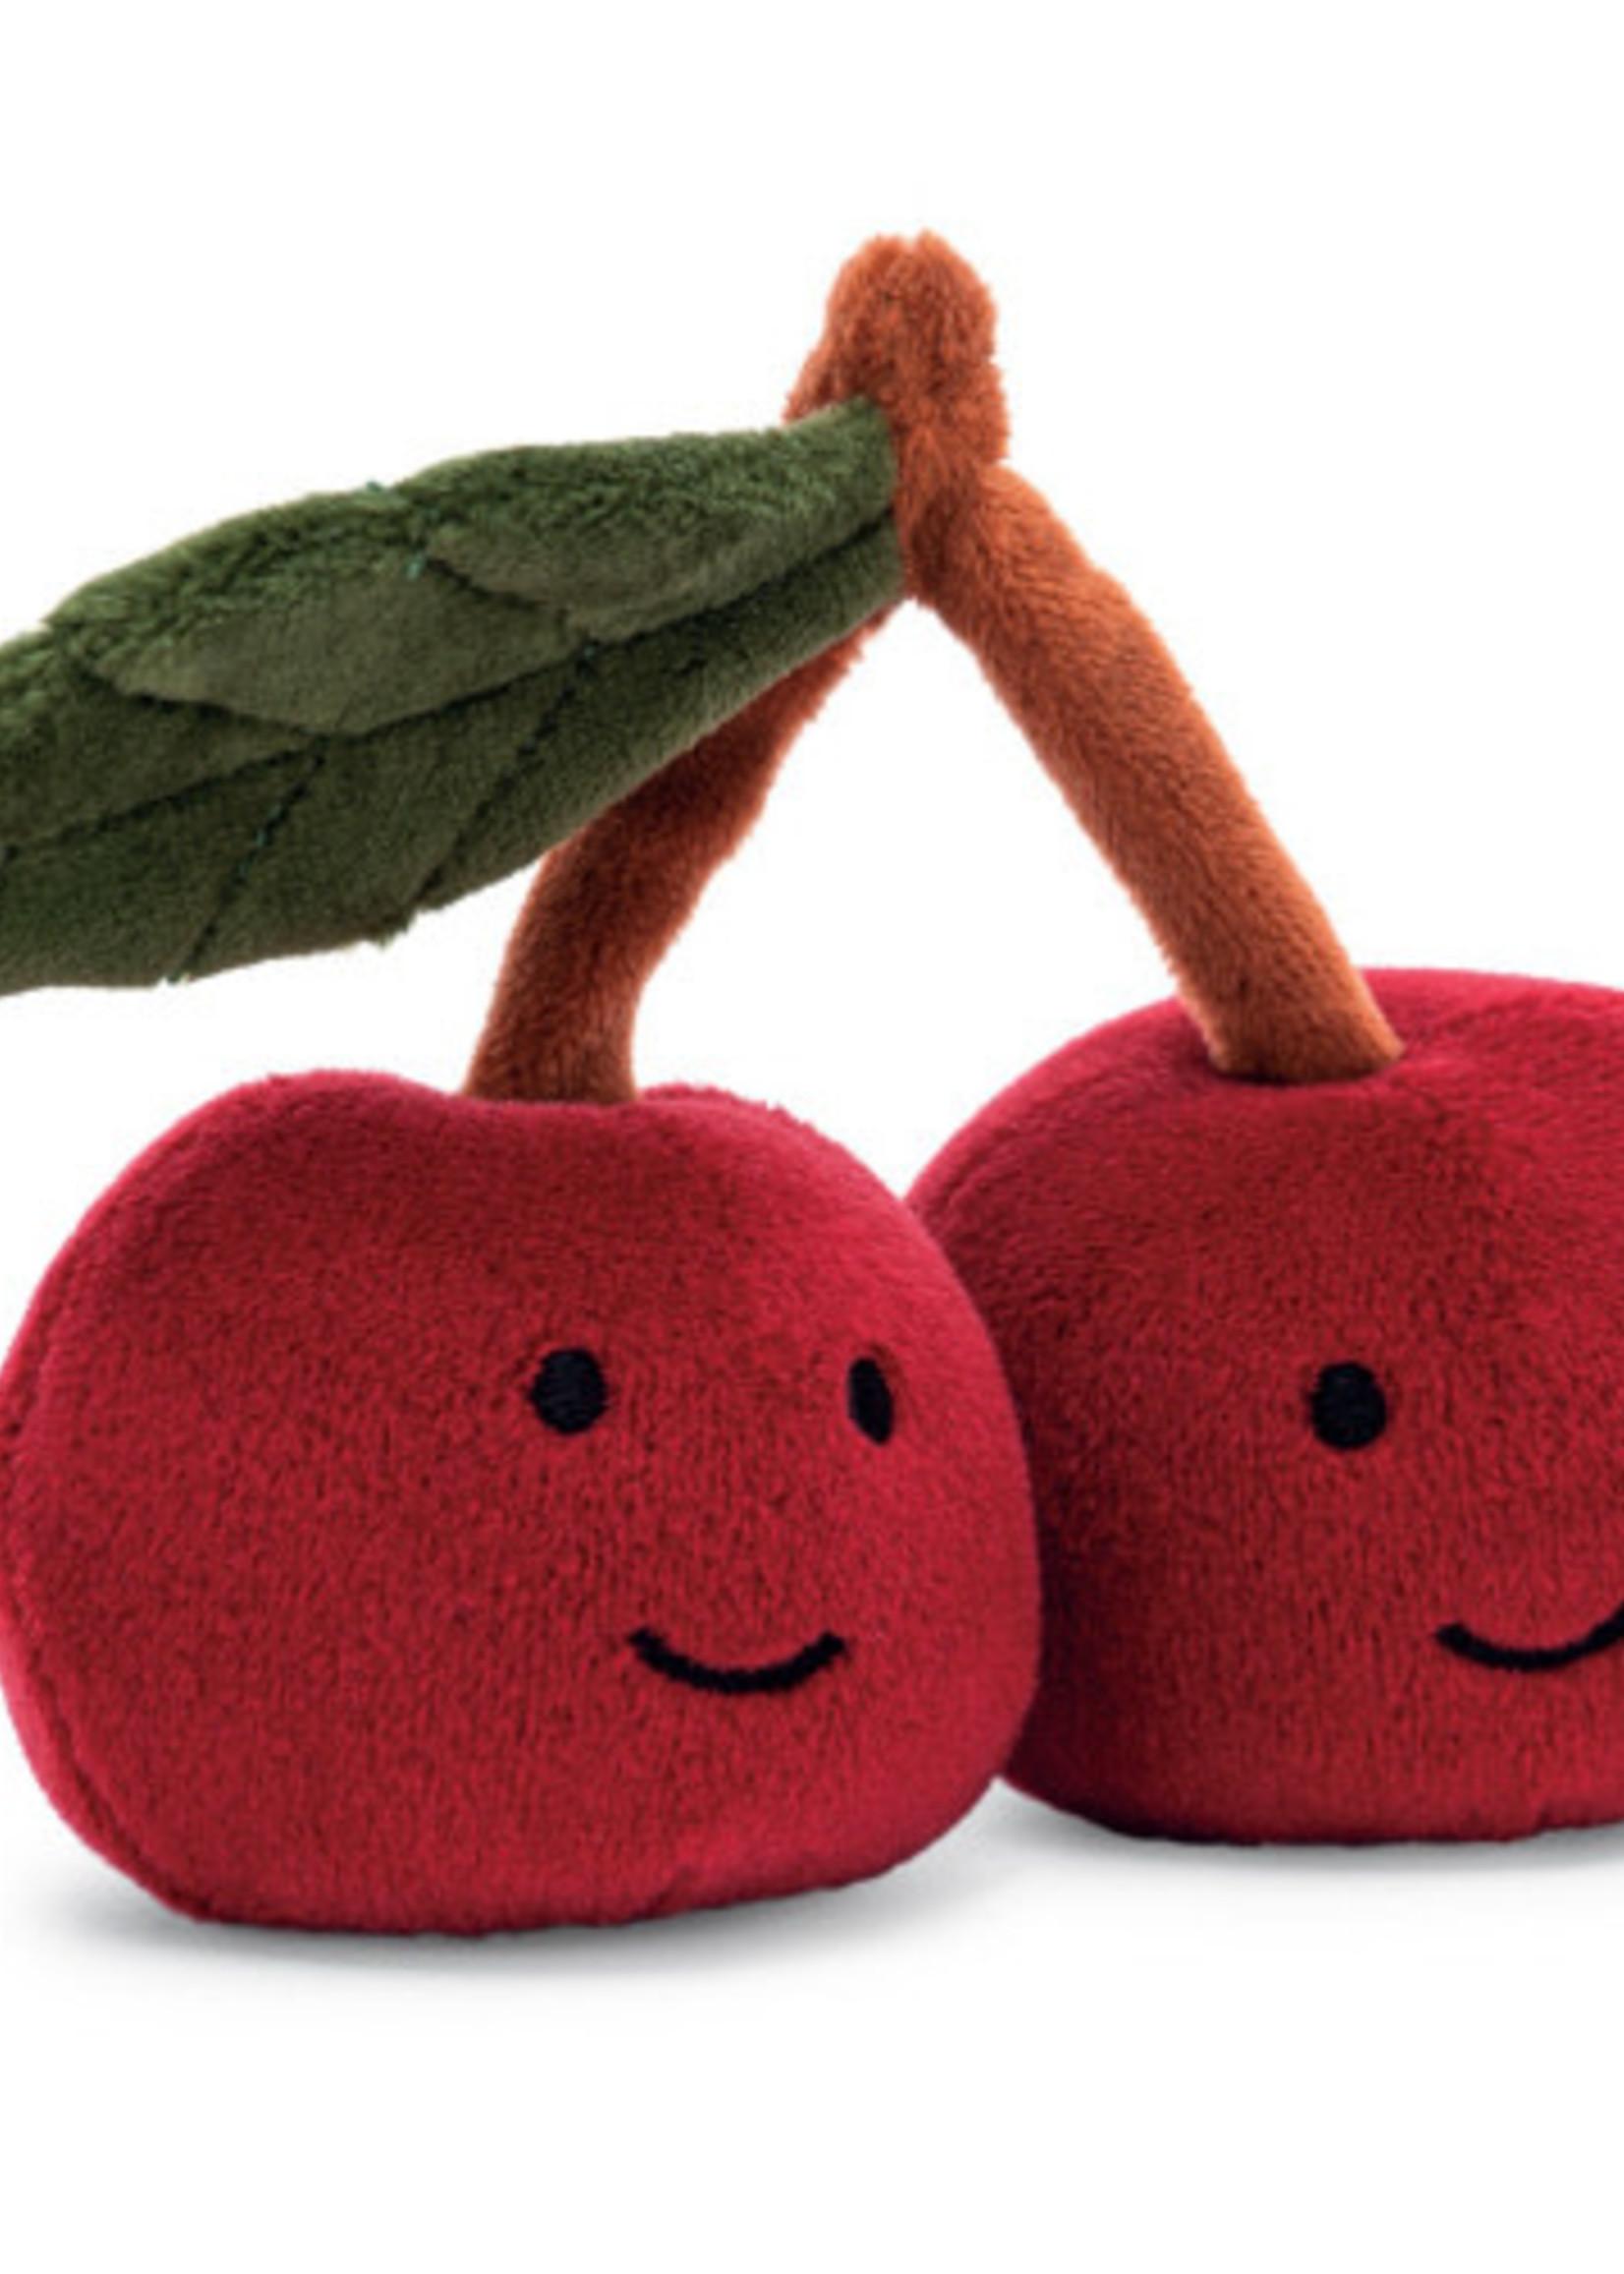 Jellycat JC Fabulous Fruit Cherry